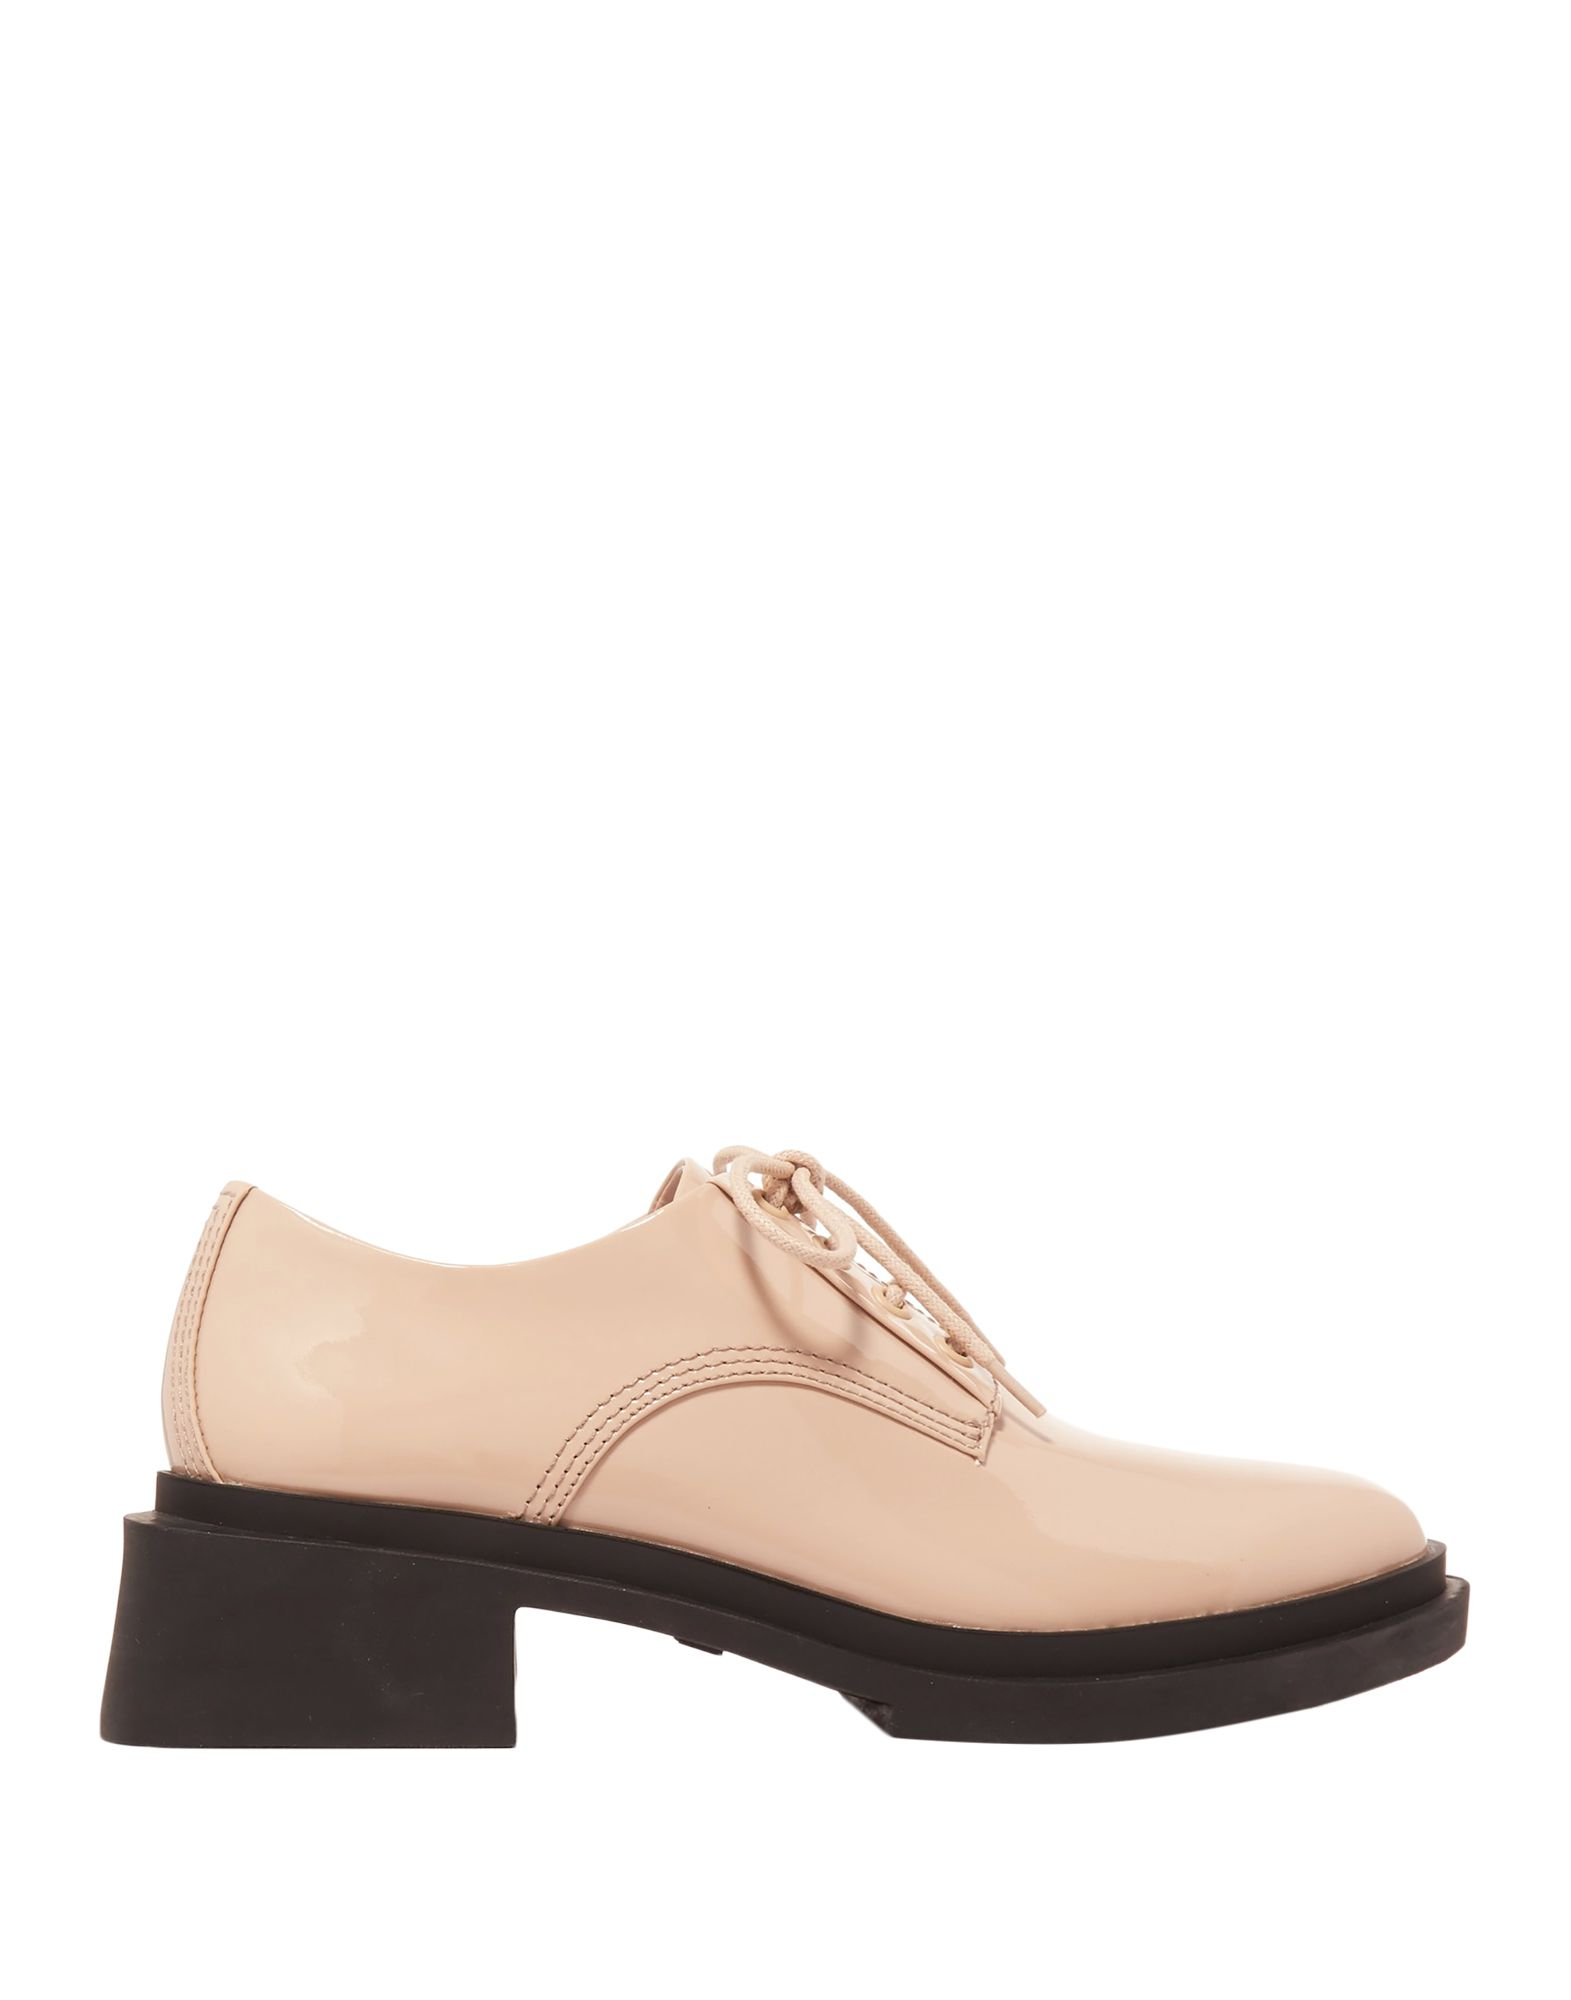 Фото - DKNY Обувь на шнурках обувь на высокой платформе dkny